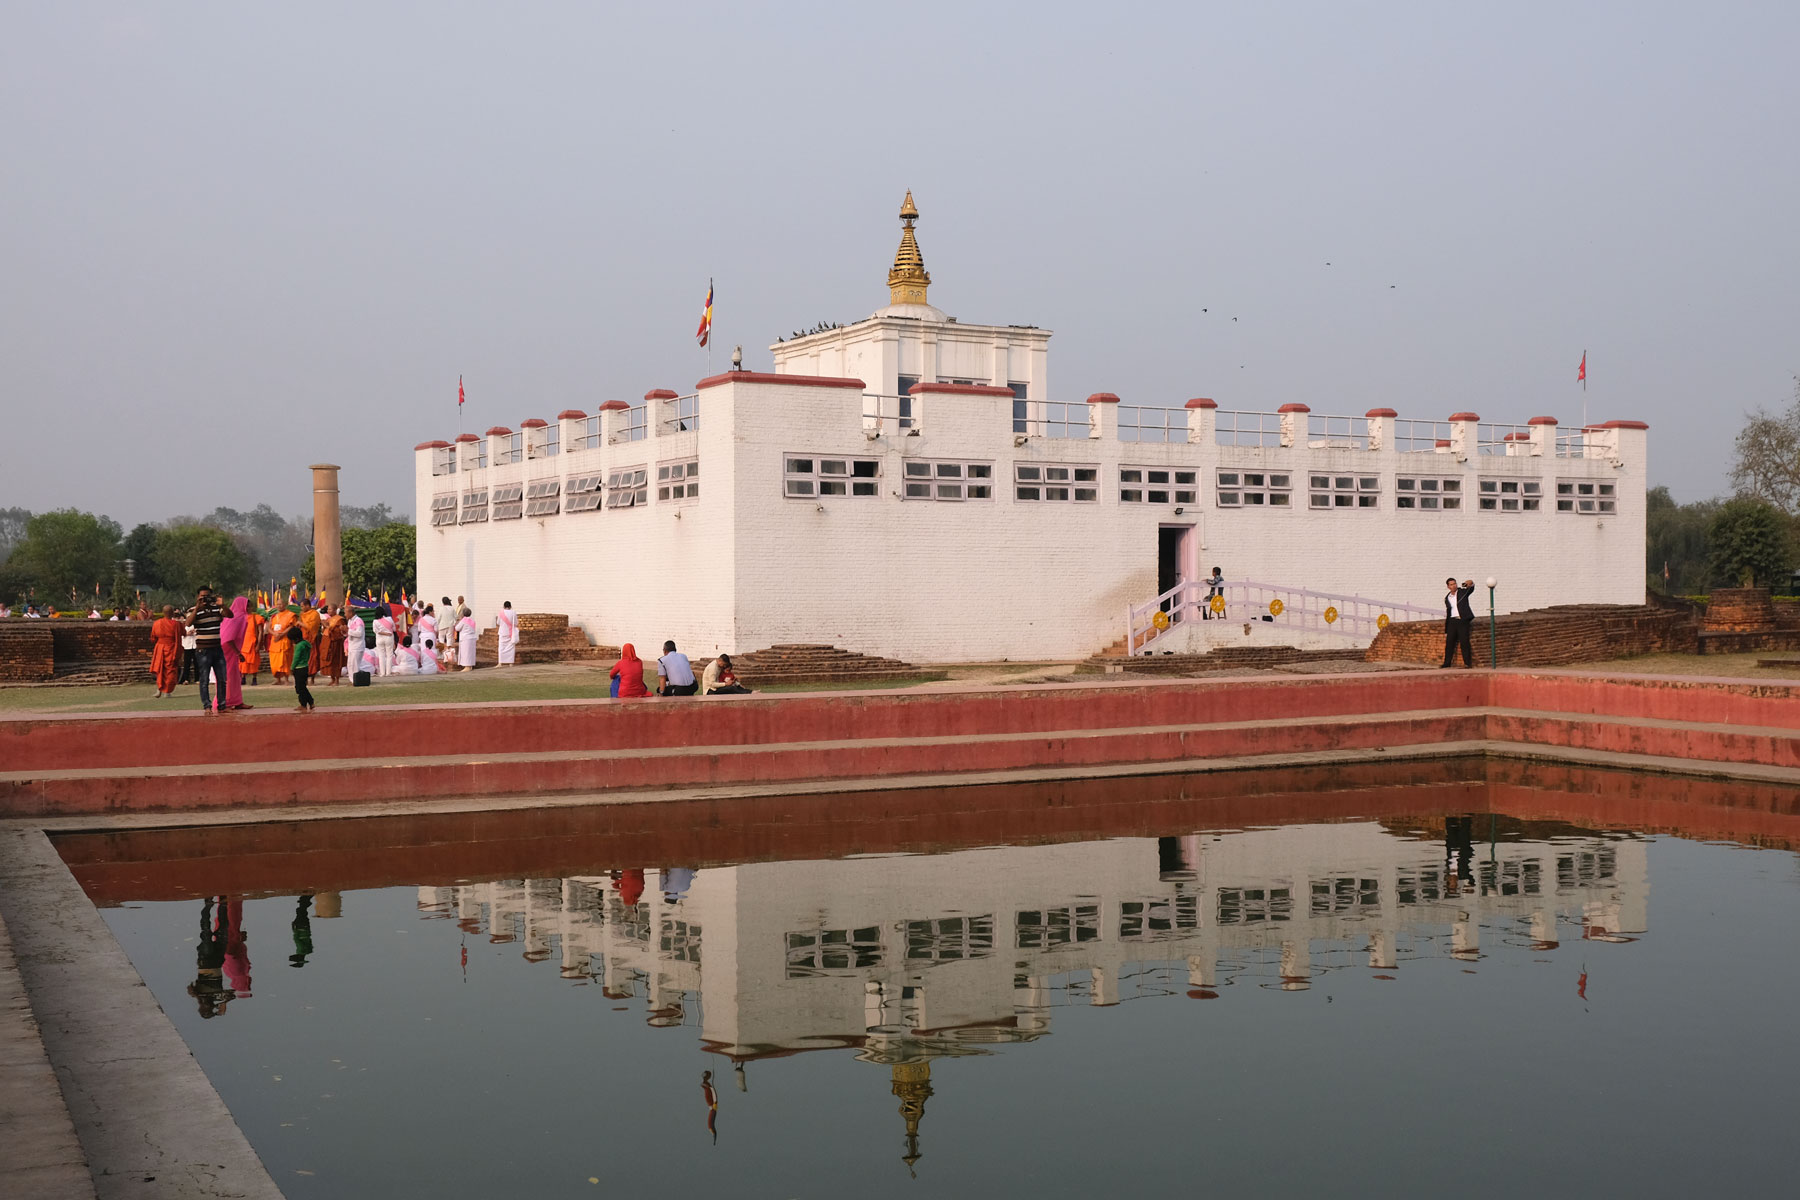 Mayadevi-Tempel in Lumbini in Nepal.